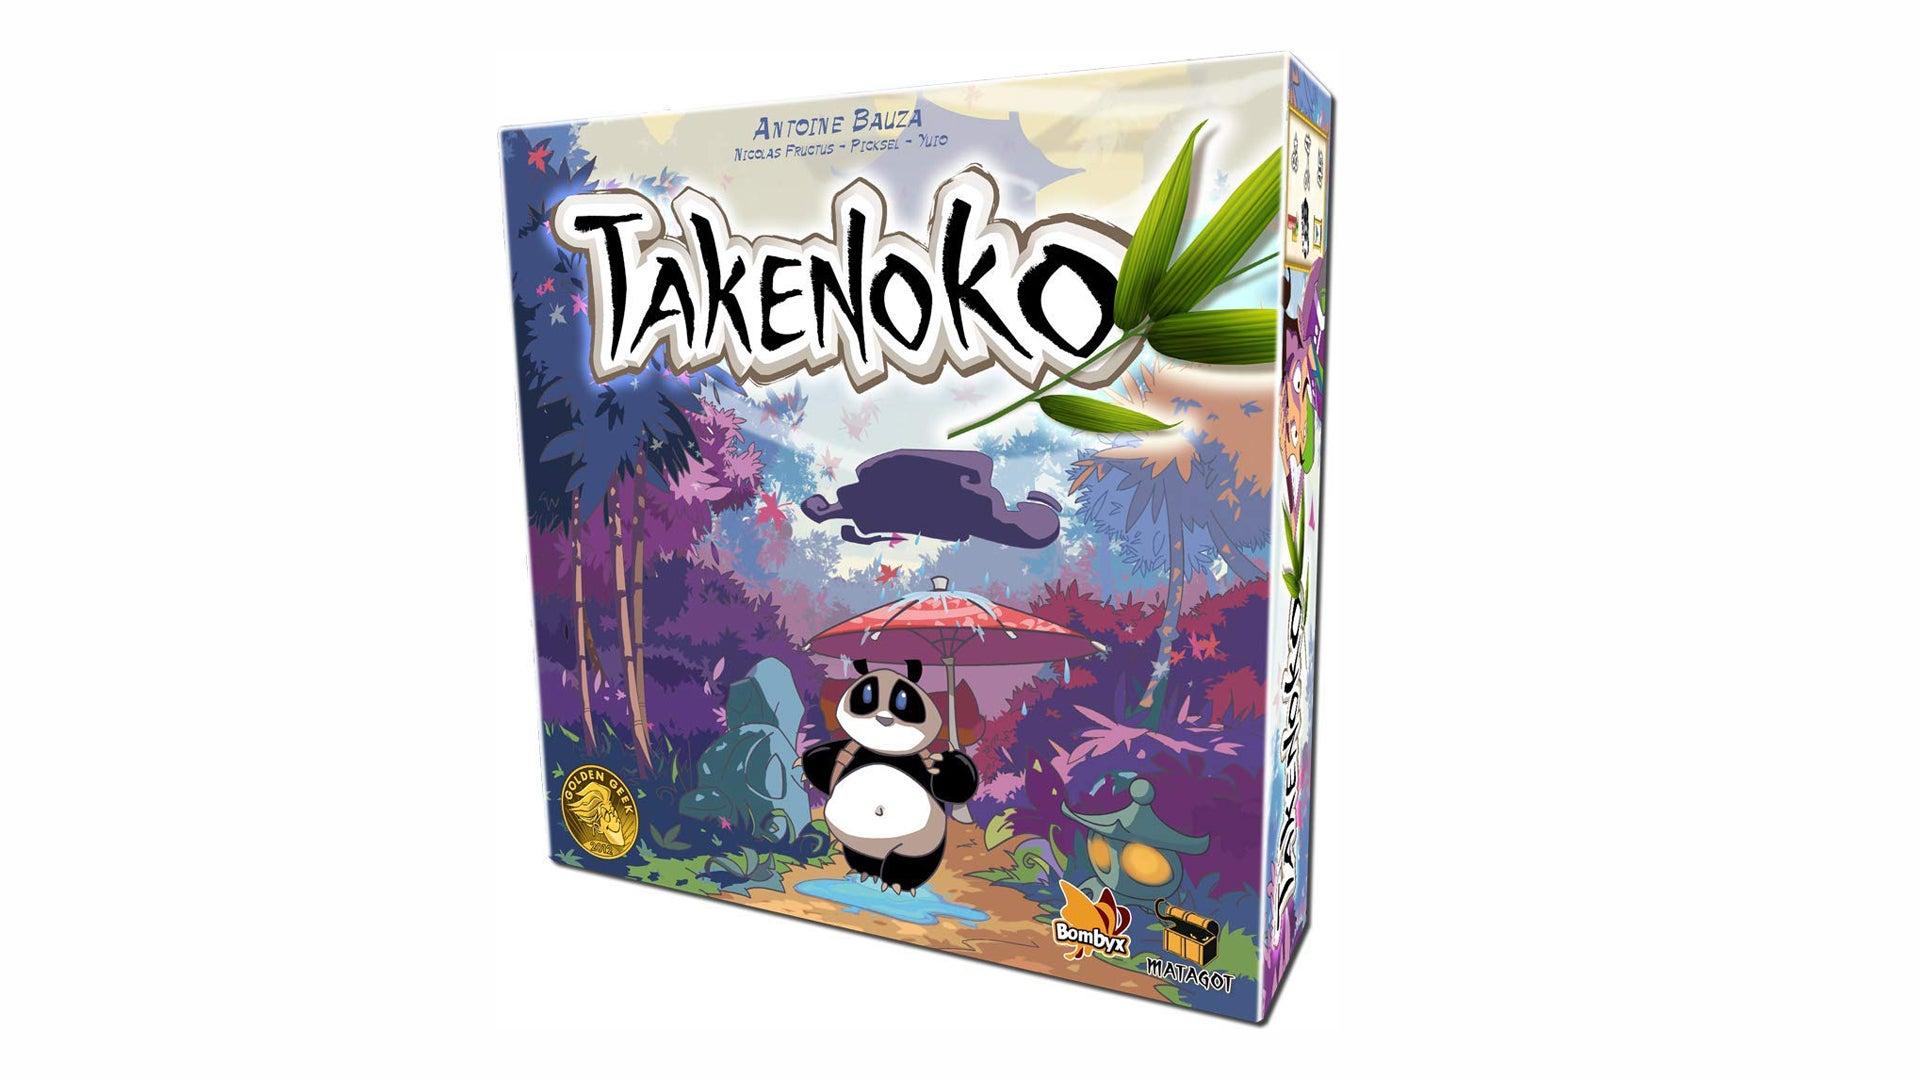 Takenoko board game artwork